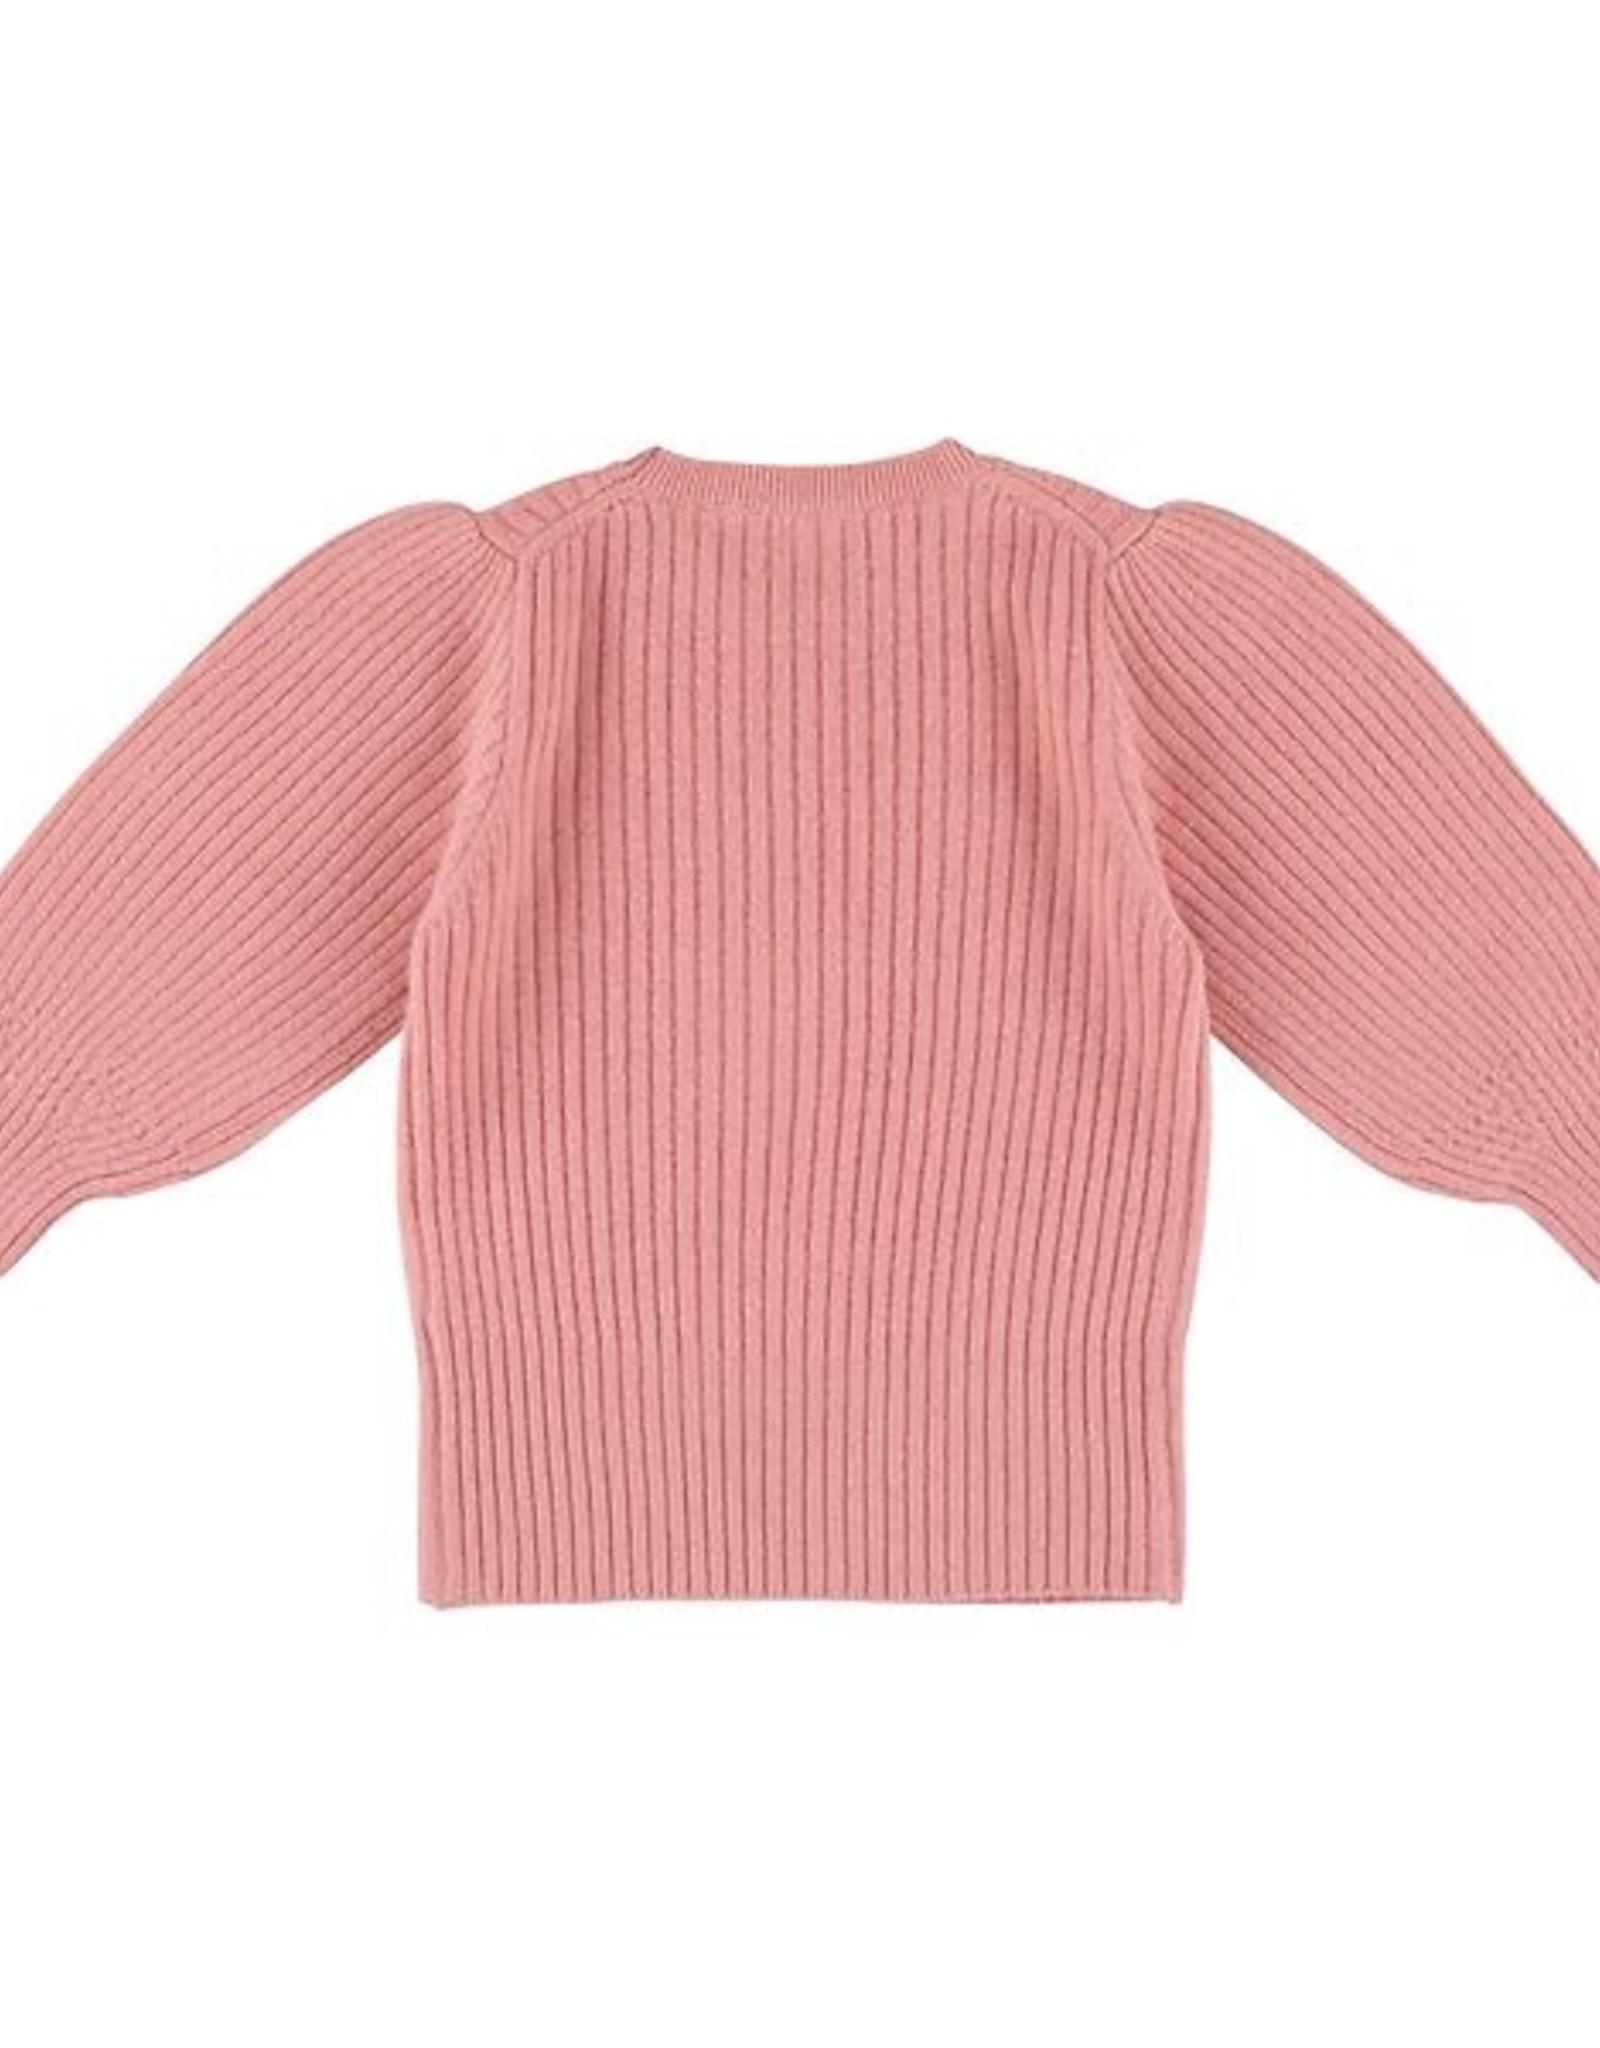 MORLEY MORLEY Oriana wool marzipan pull